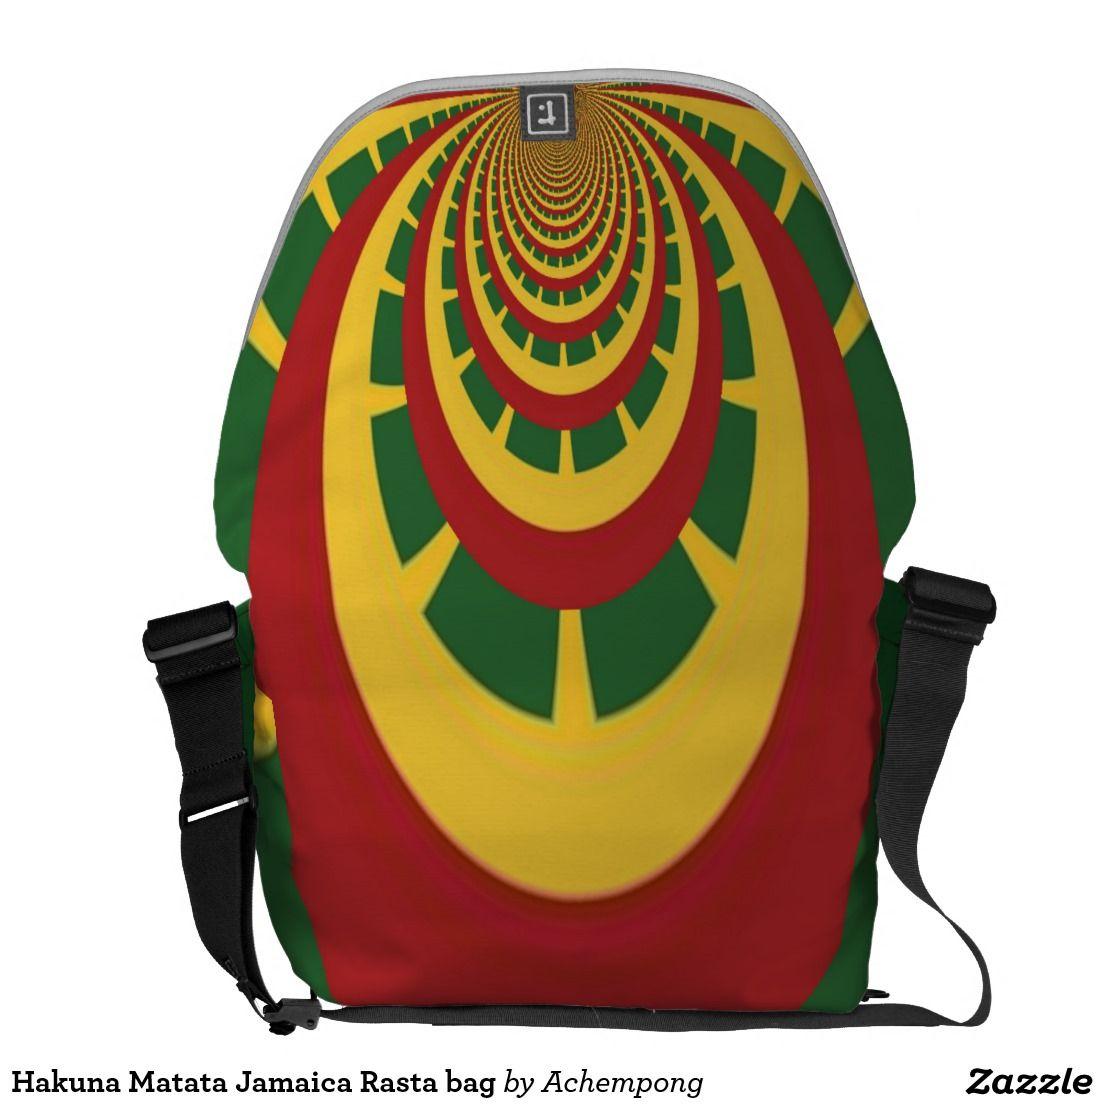 Bolso de Hakuna Matata Jamaica Rasta | Pinterest | Hakuna matata